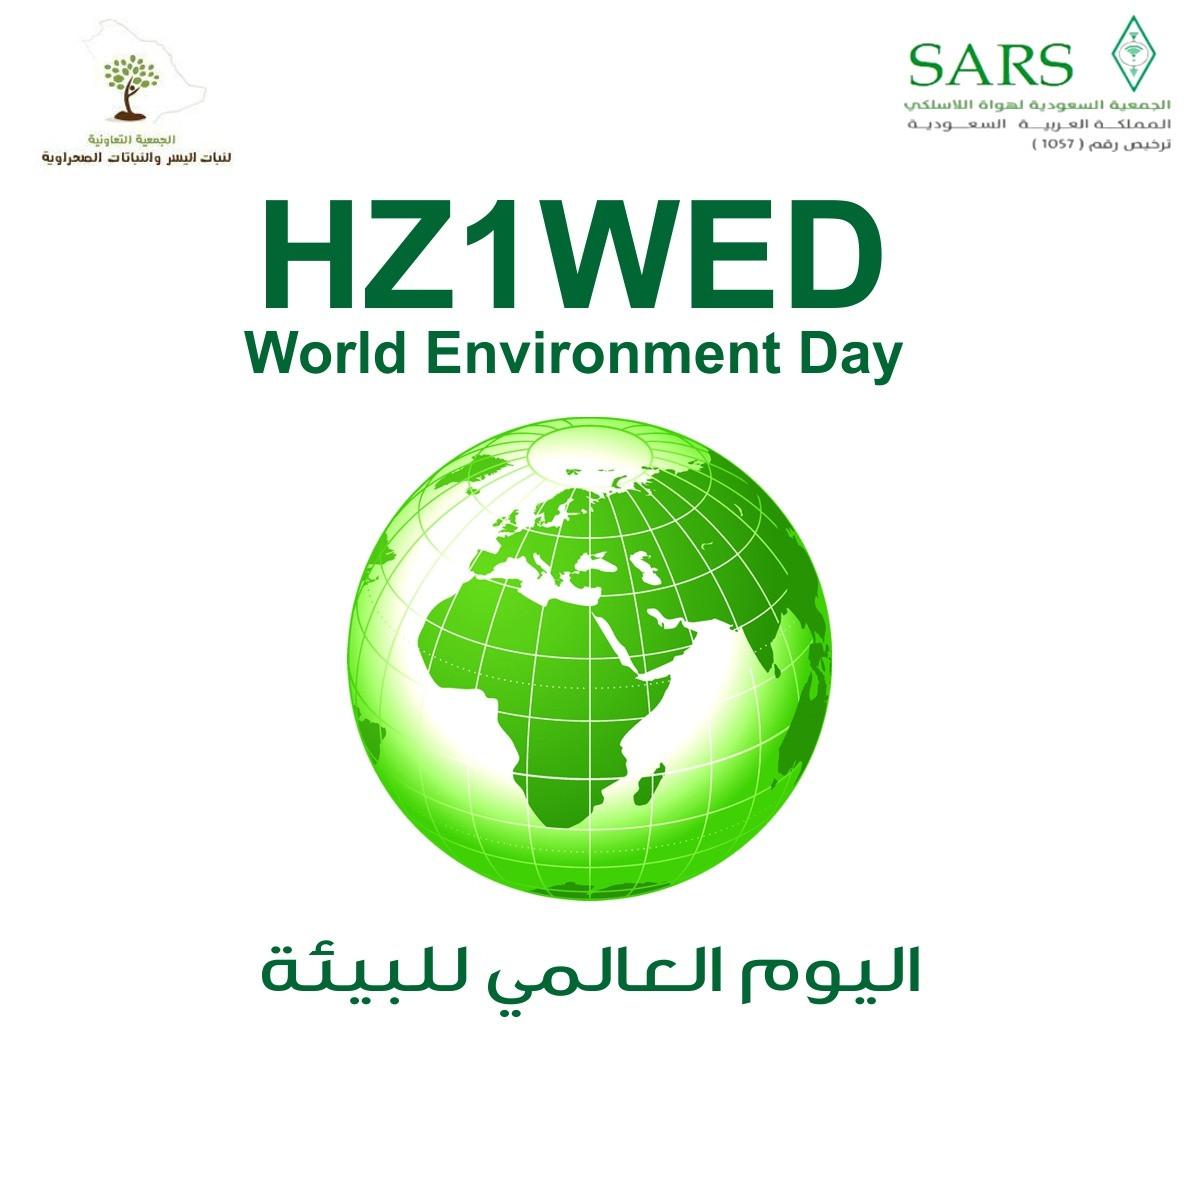 HZ1WED World Environment Day, Riyadh, Saudi Arabia